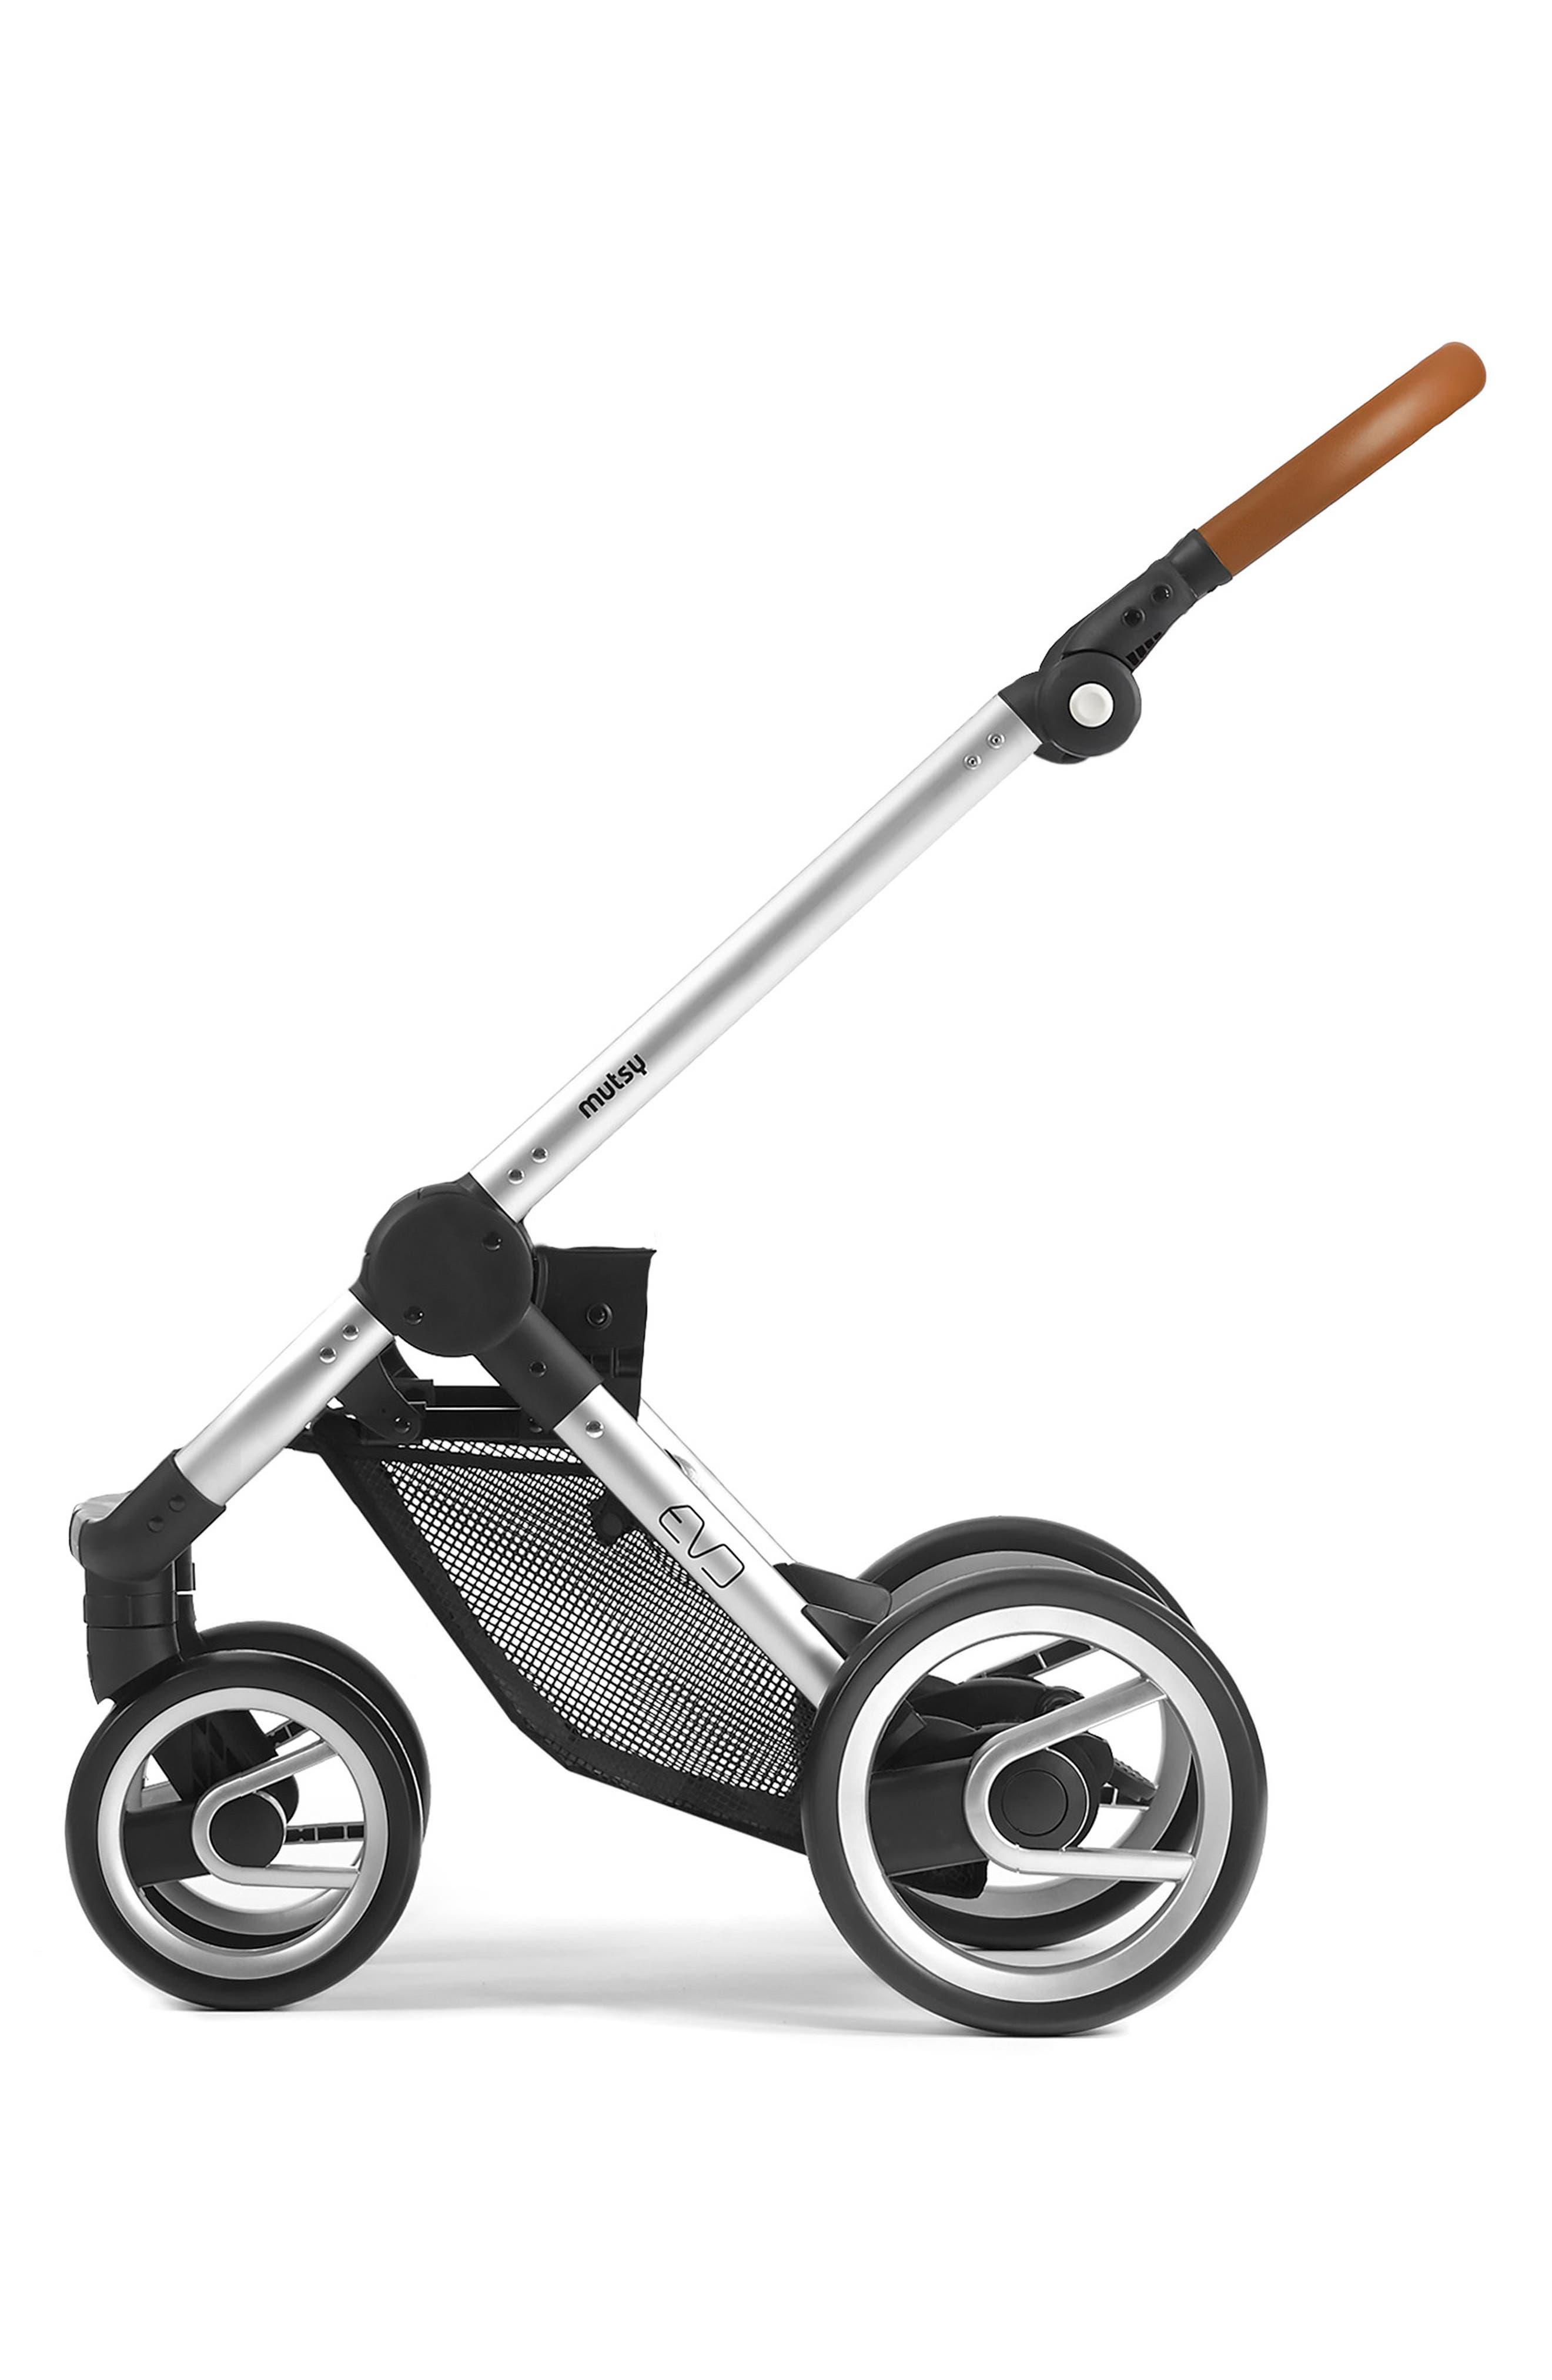 Evo - Urban Nomad Stroller,                             Alternate thumbnail 3, color,                             040